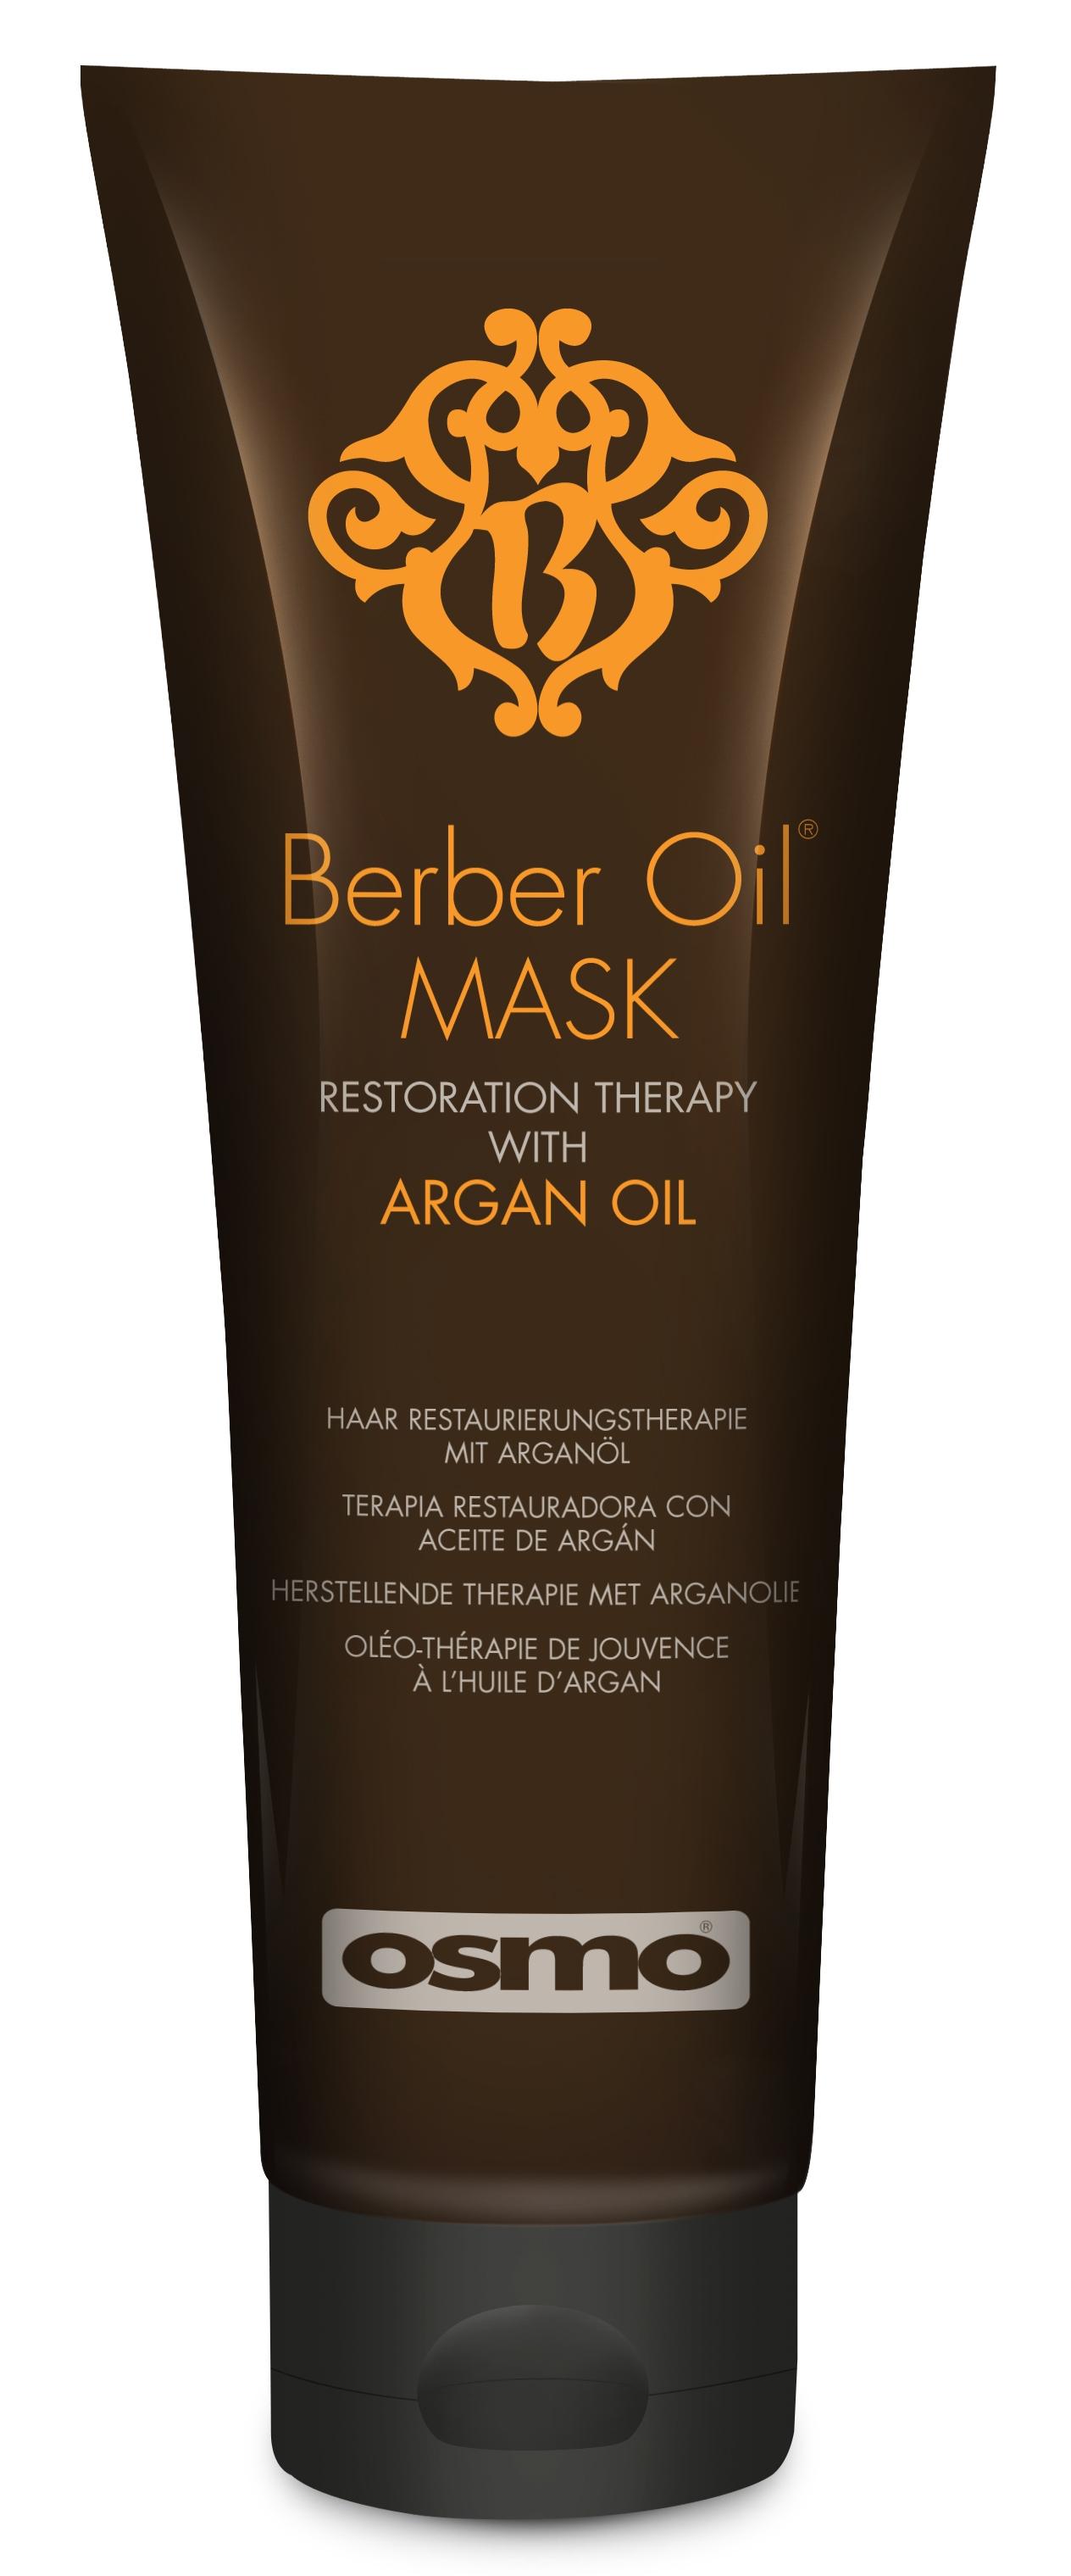 OSMO Маска восстановление и лечение Берберское масло / The Berber Oil Collection 250мл